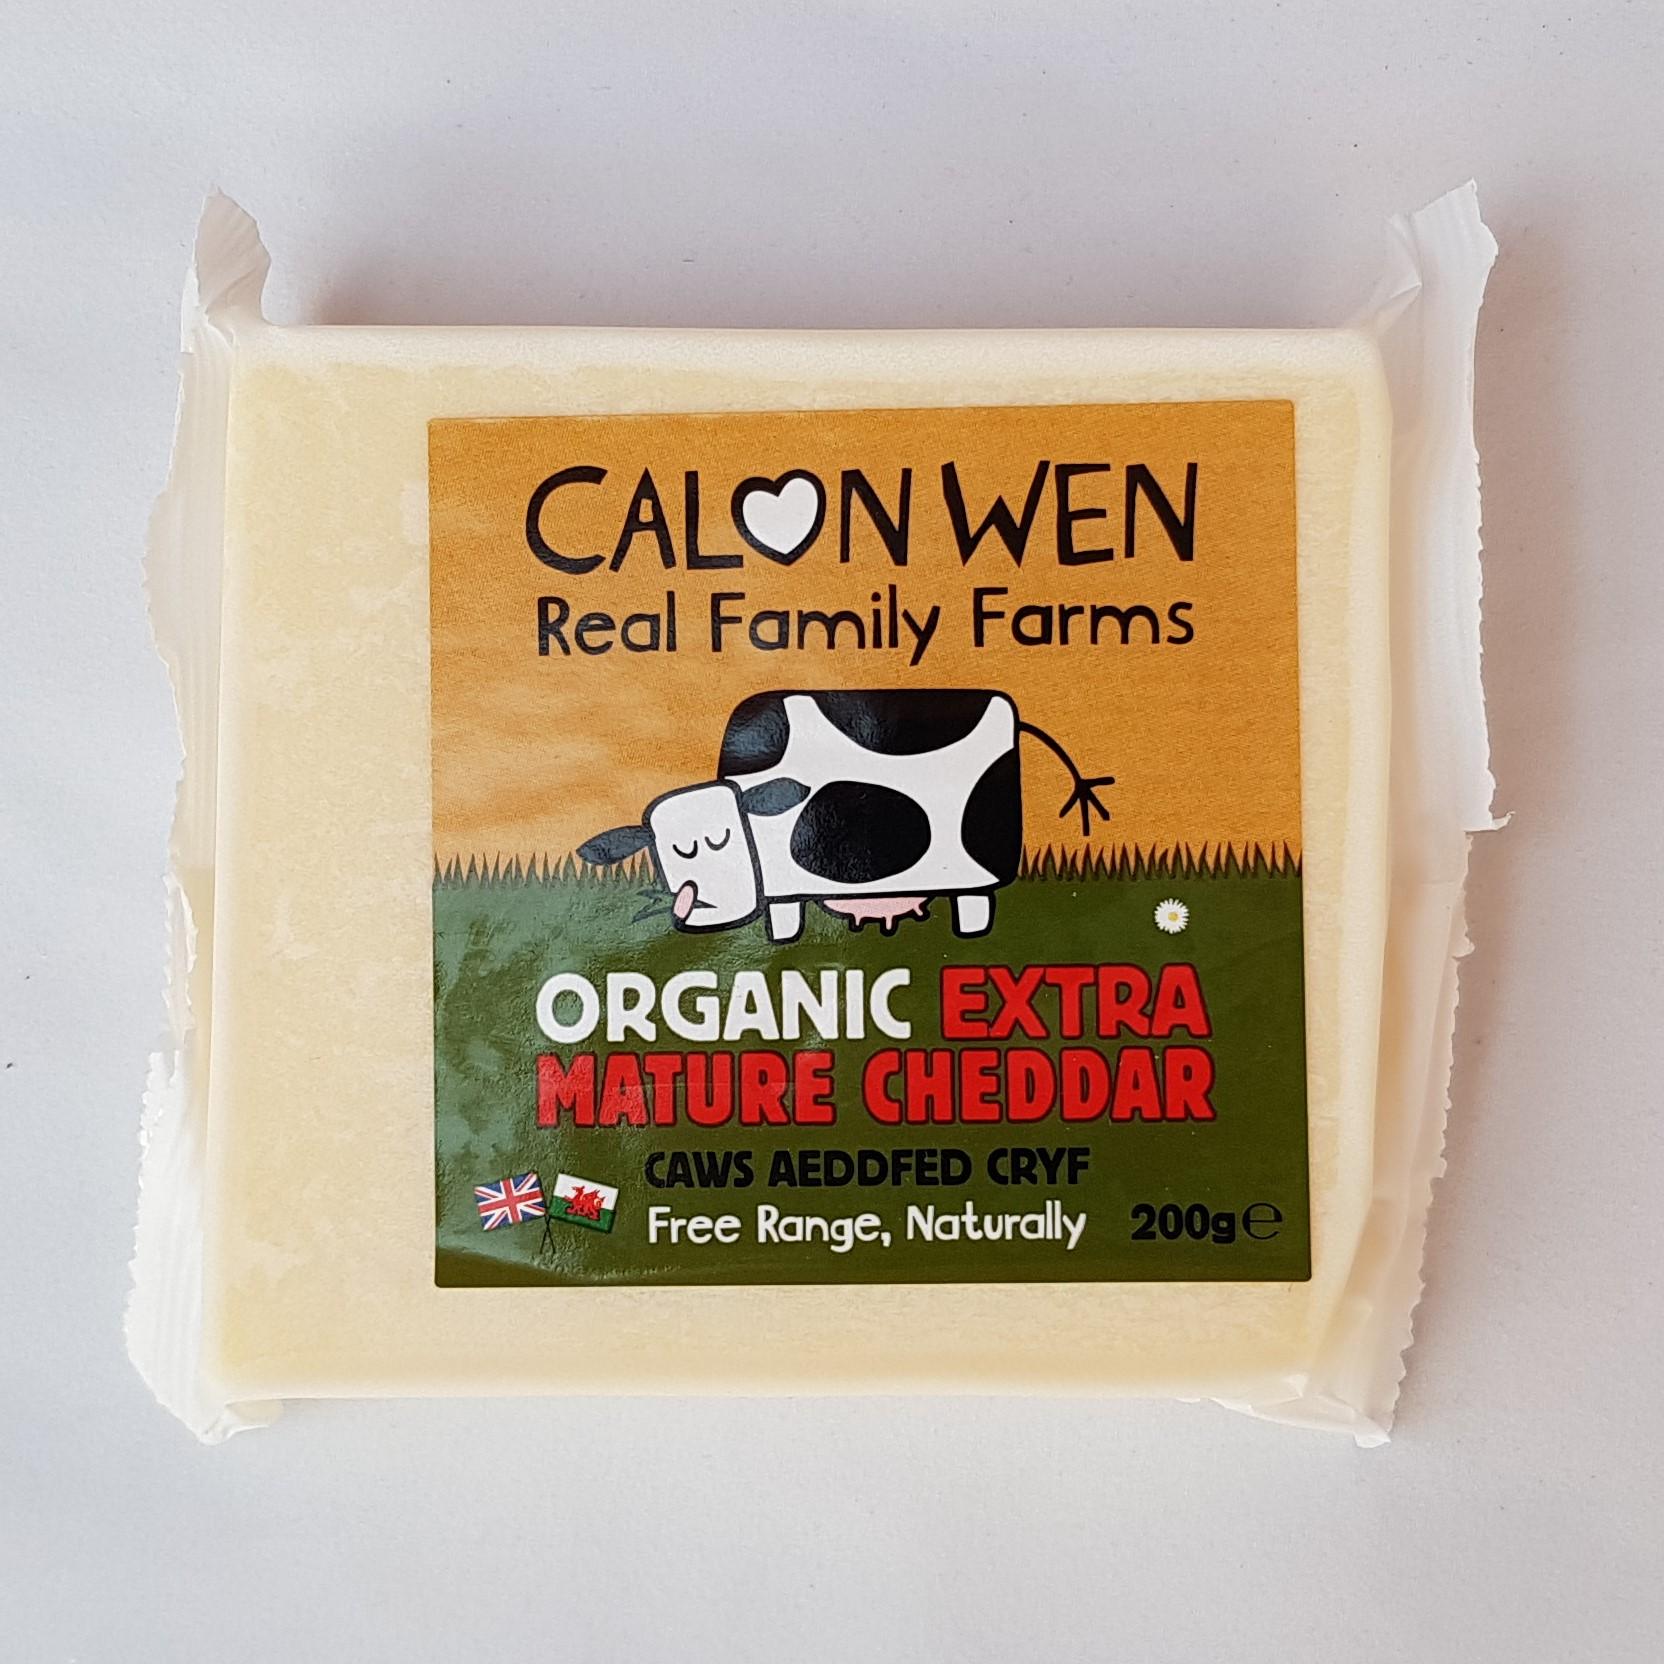 Calon Wen Extra Mature Cheddar Cheese